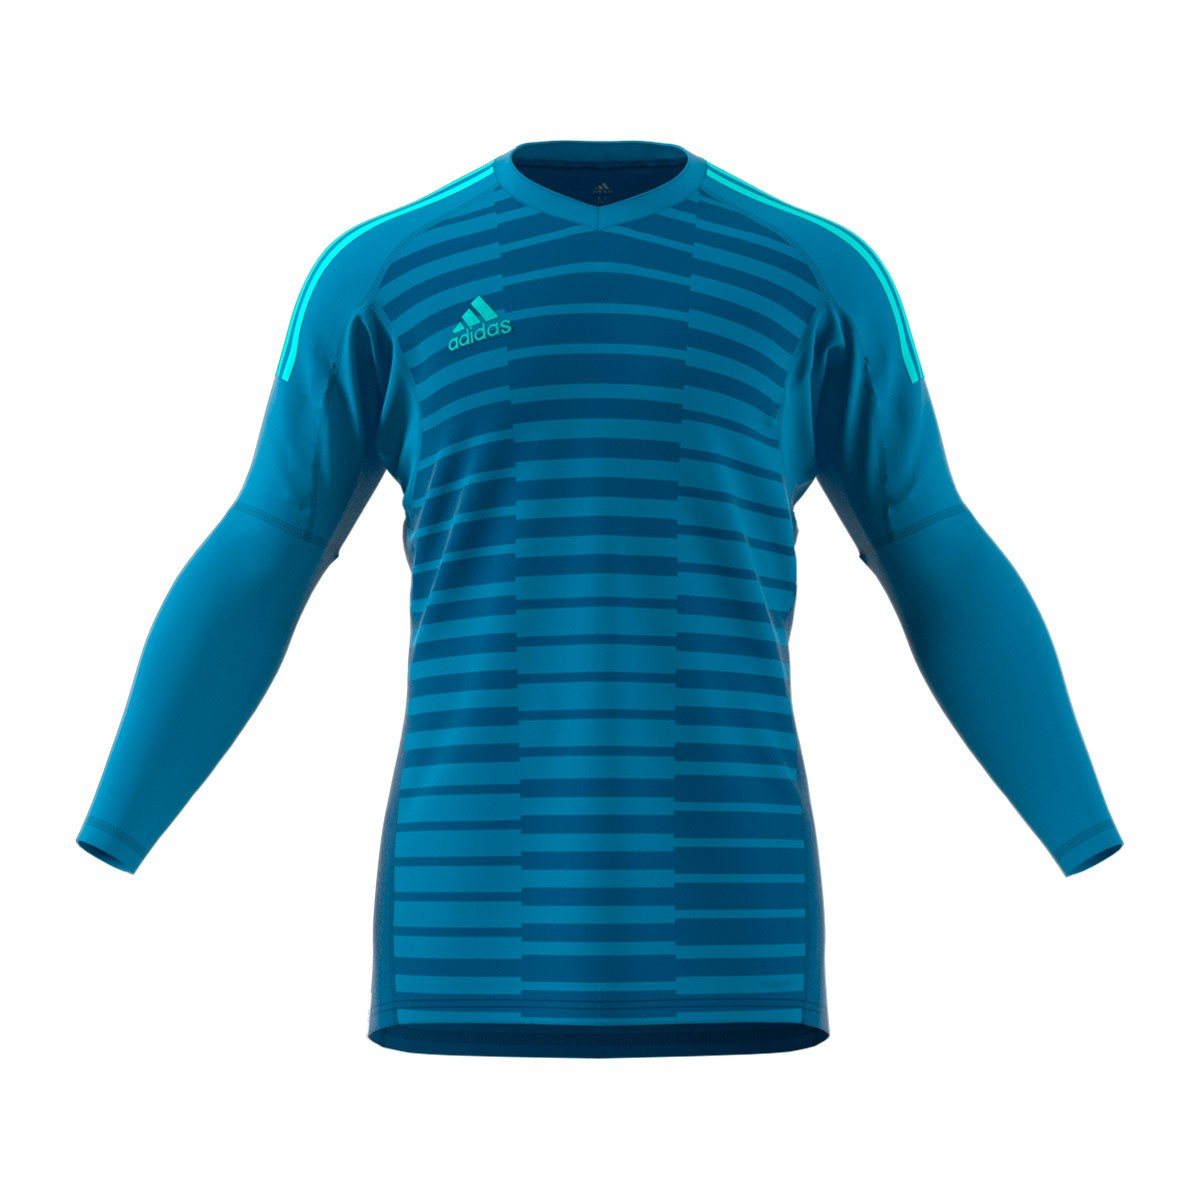 25d78f3d9436 Jersey adidas AdiPro 18 Goalkeeper Longsleeve Bold aqua-Unity blue-Energy  aqua - Football store Fútbol Emotion